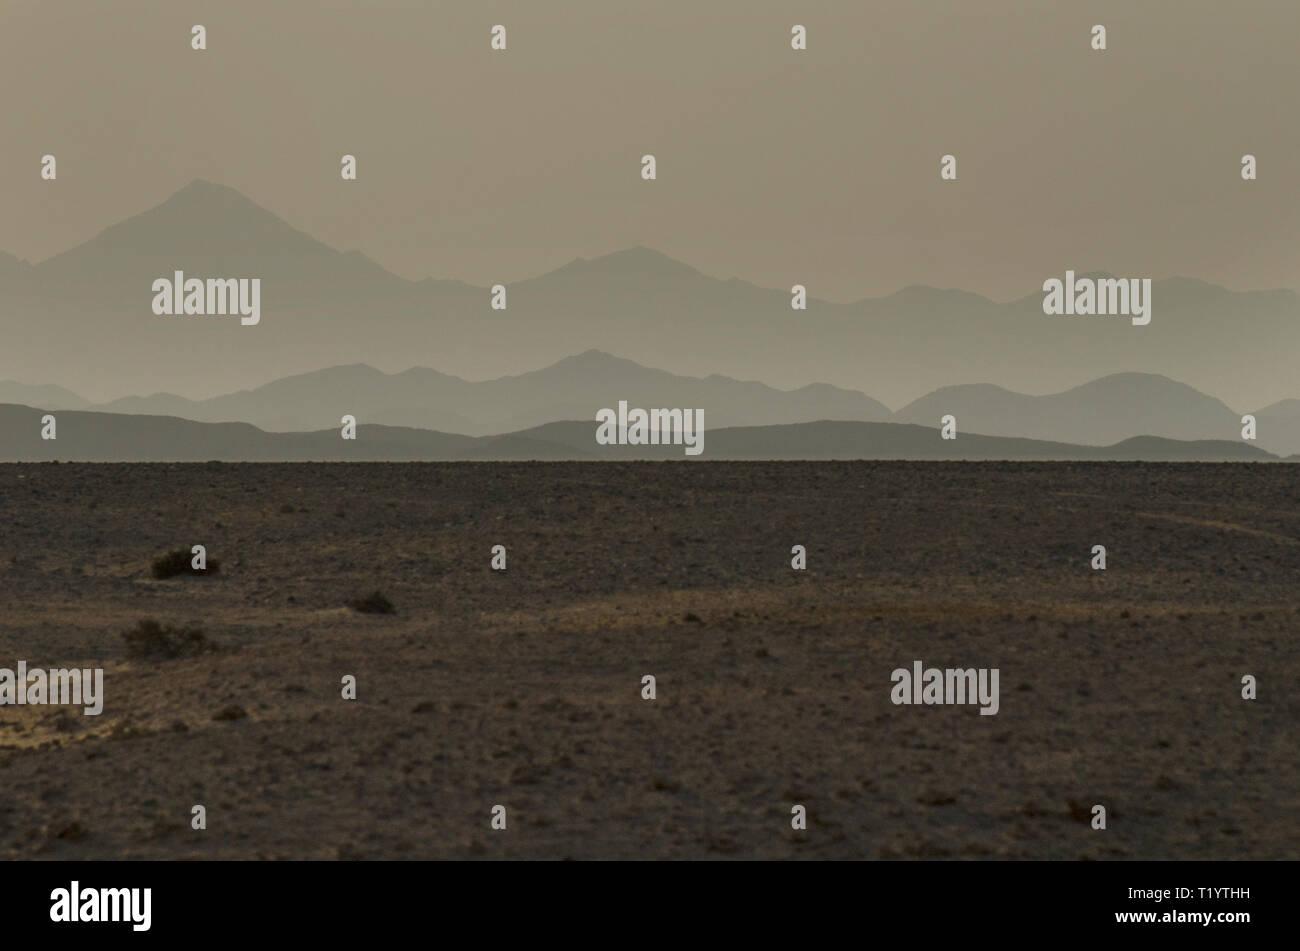 Empty Desert view with fading mountains, Hamata, Egypt - Stock Image